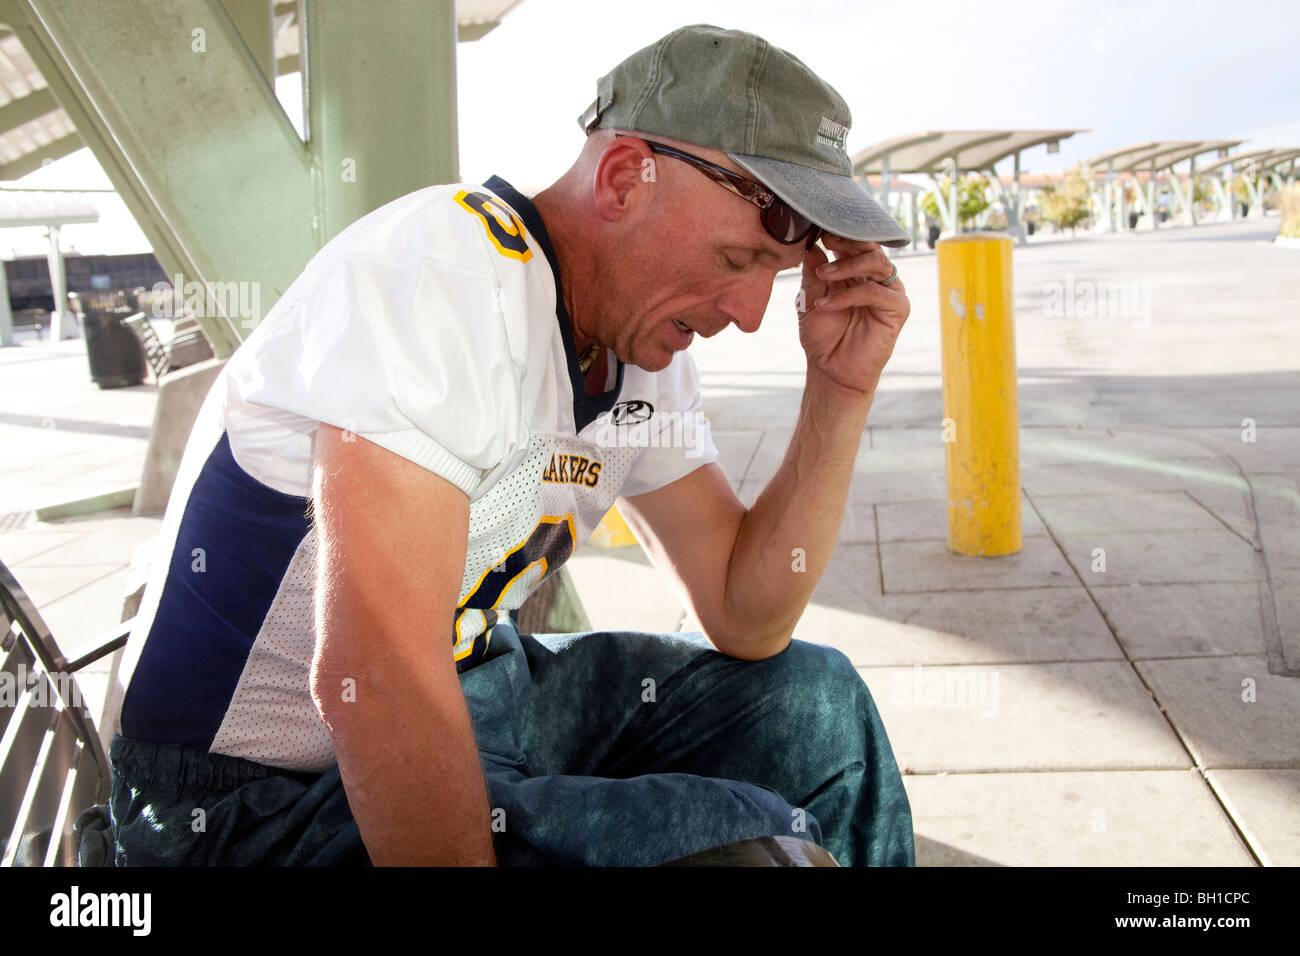 Distressed Man Waiting at Greyhound Bus Station - Stock Image